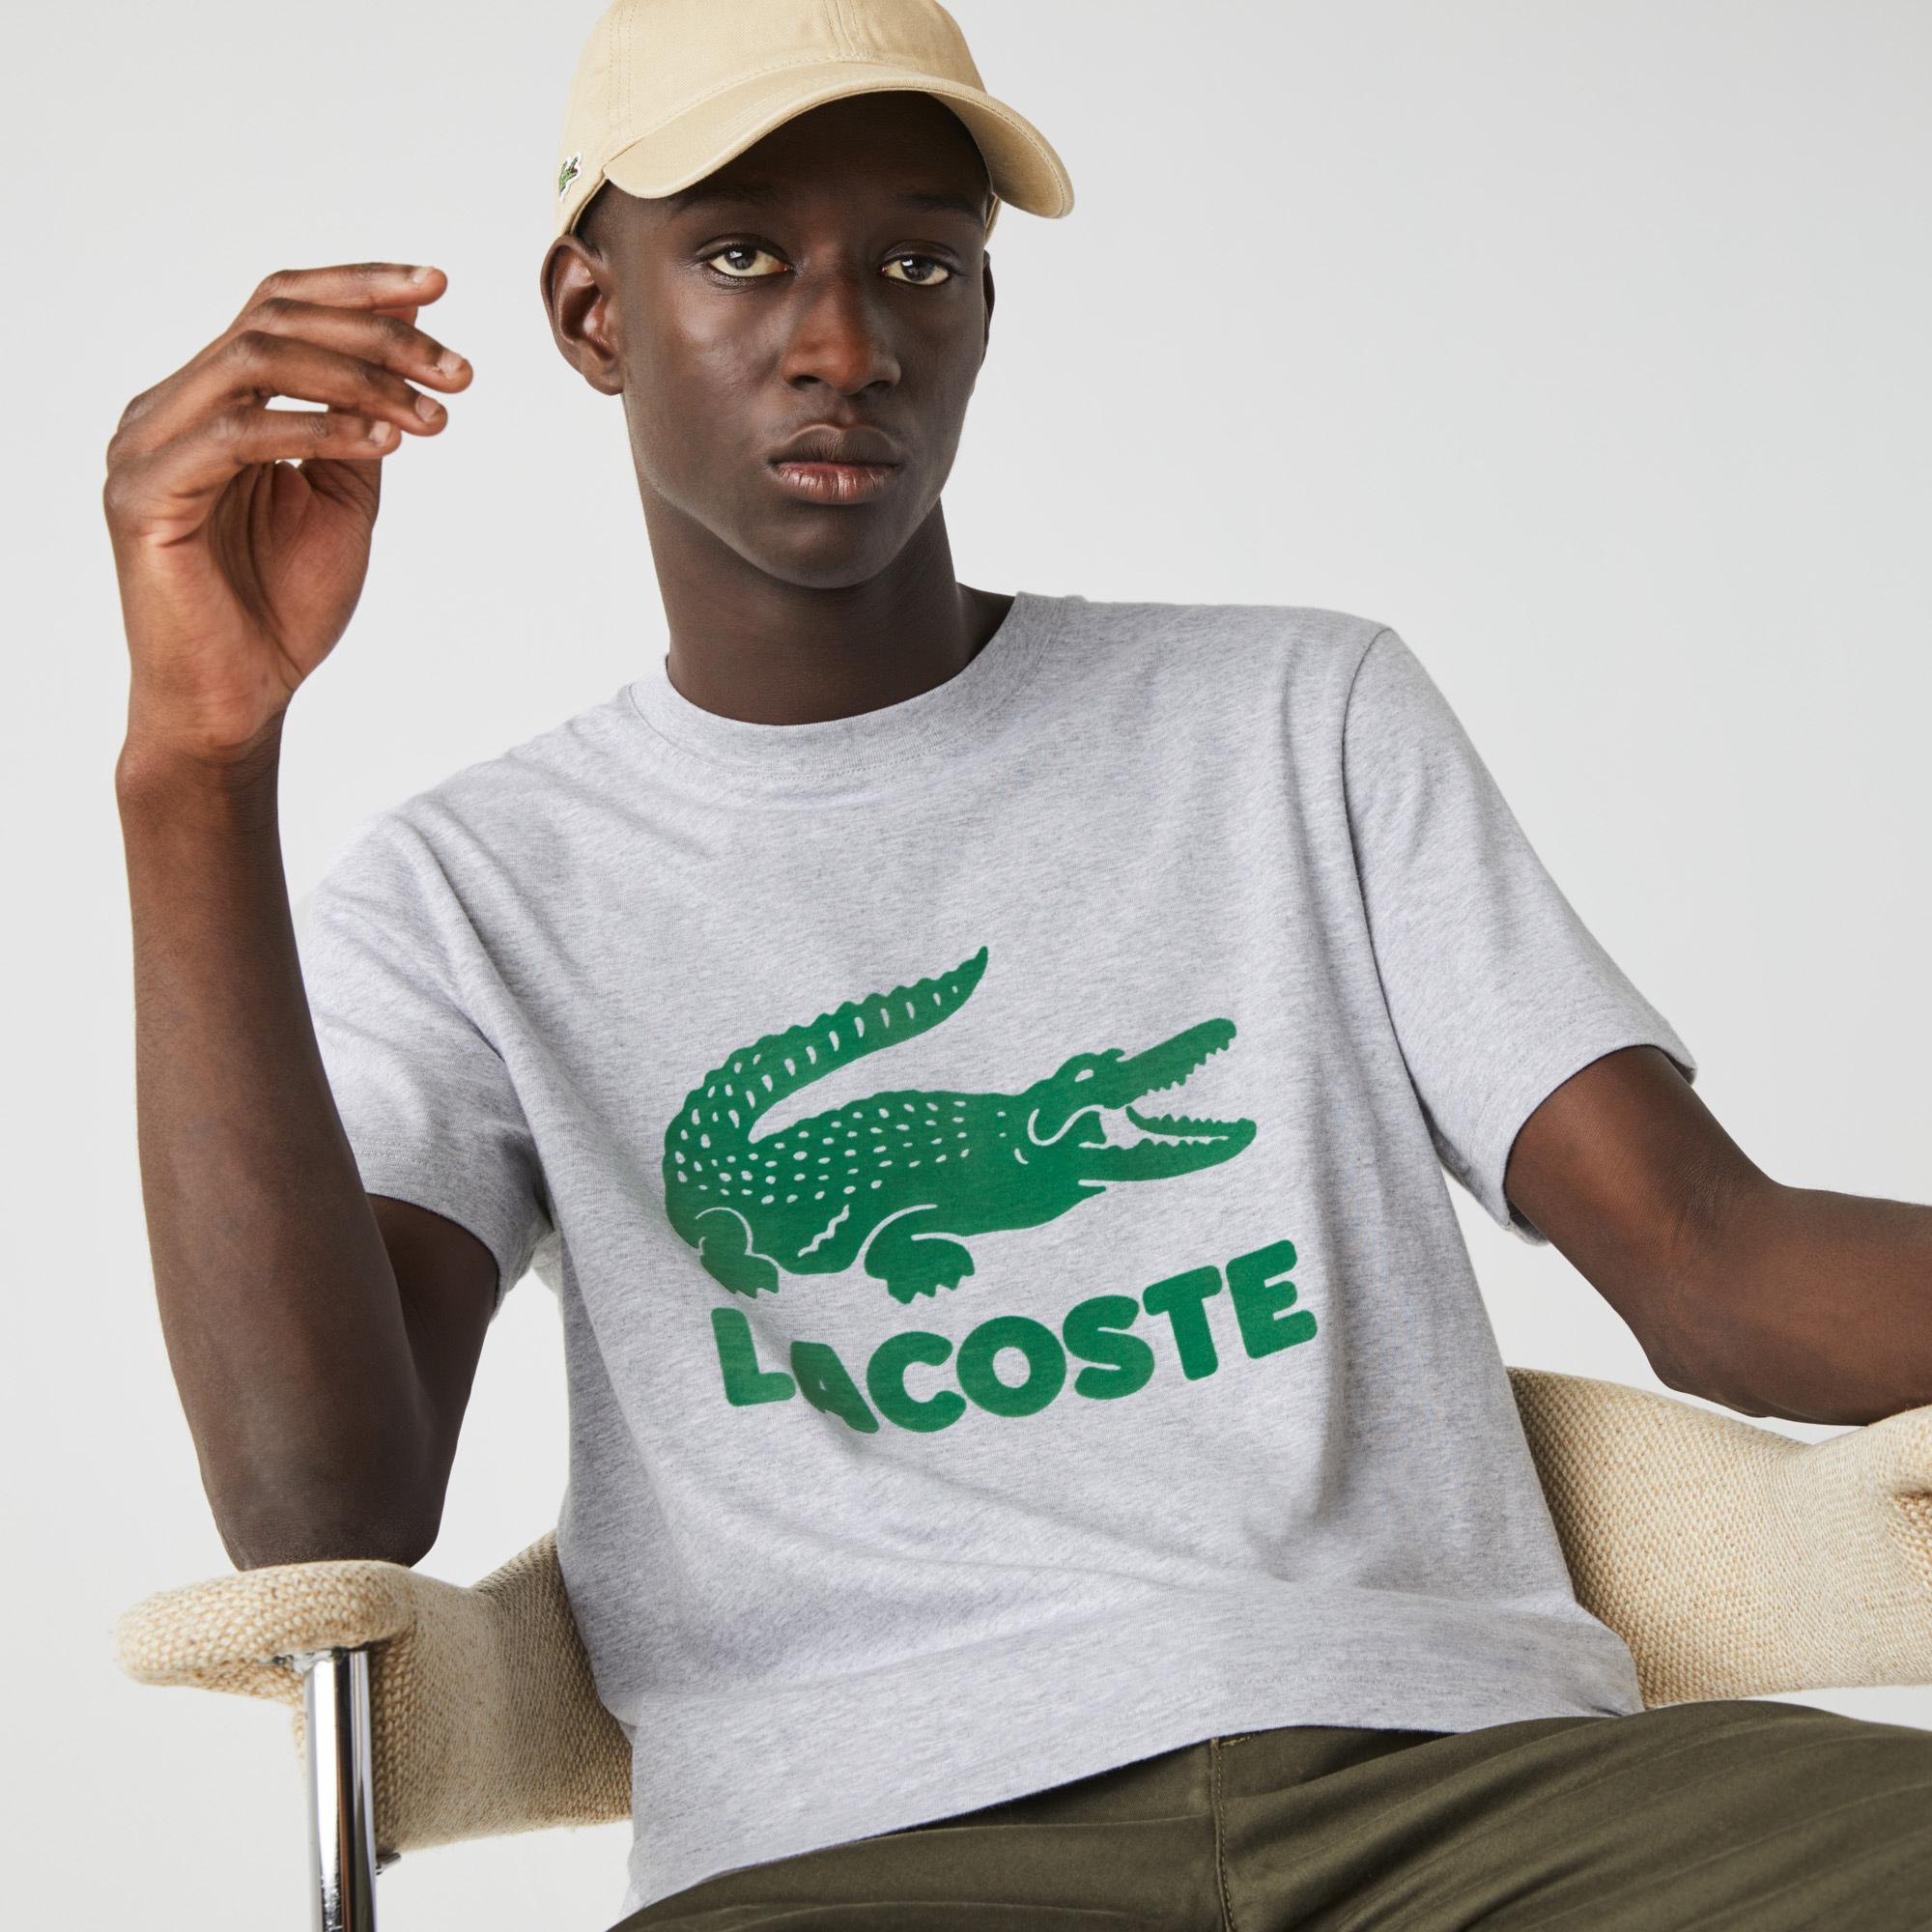 Lacoste Men's Printed Logo Cotton T-shirt